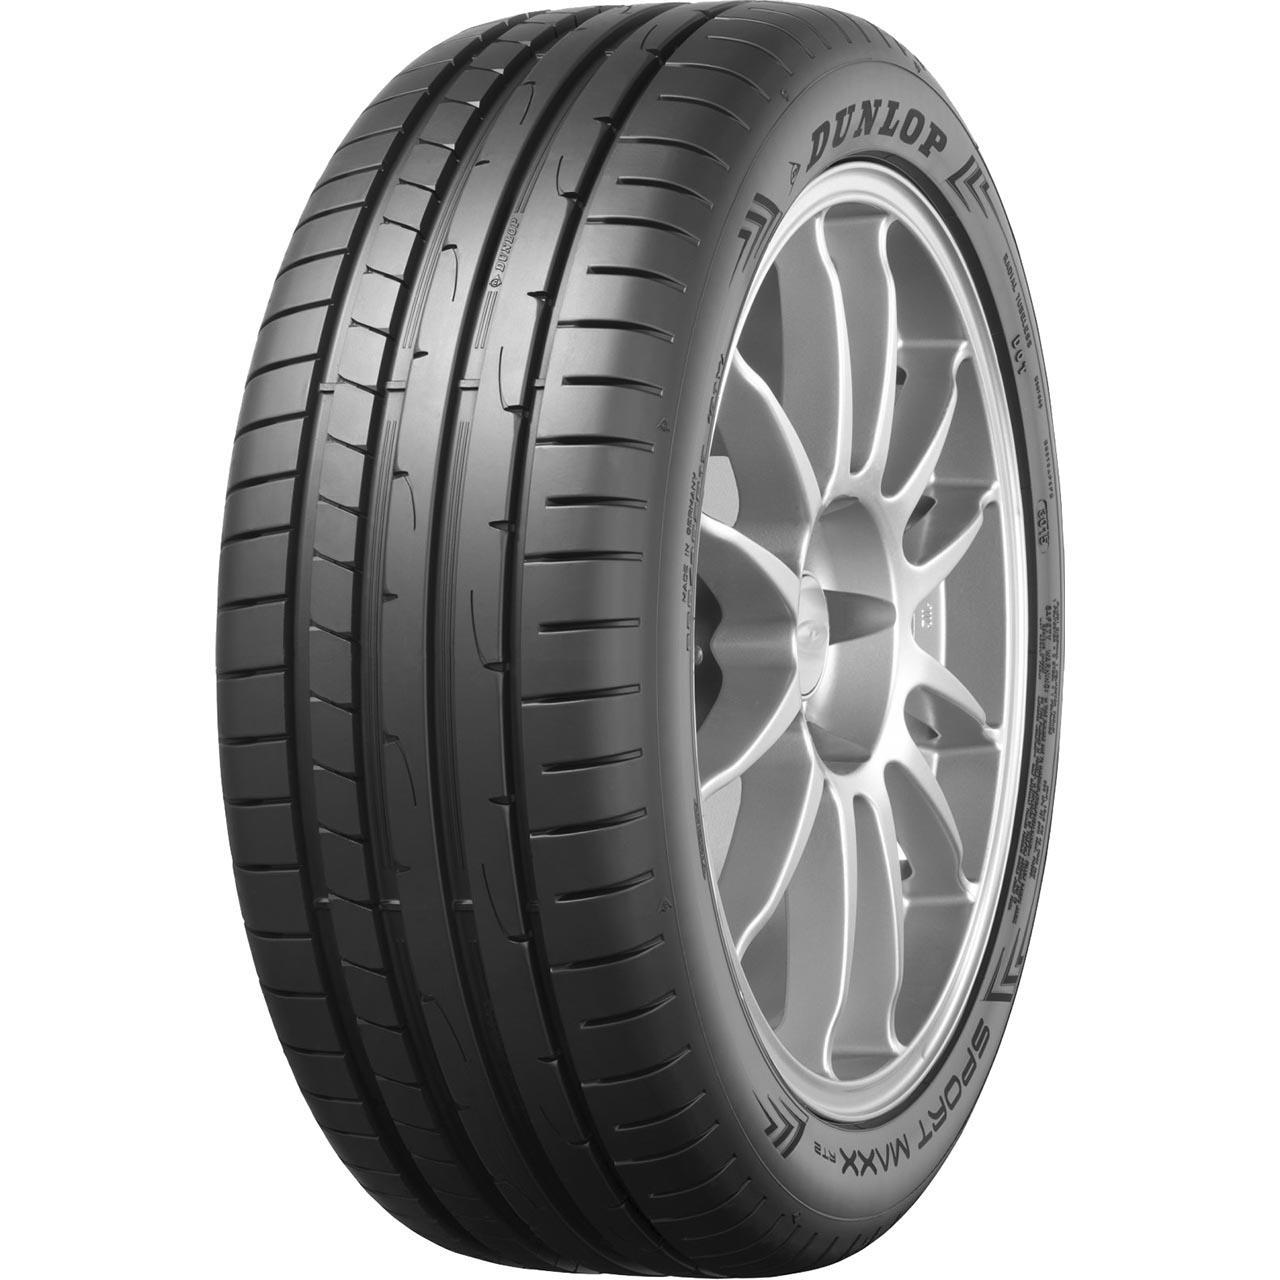 Dunlop SP Sport Maxx RT 2 245/40ZR18 (93Y) MFS